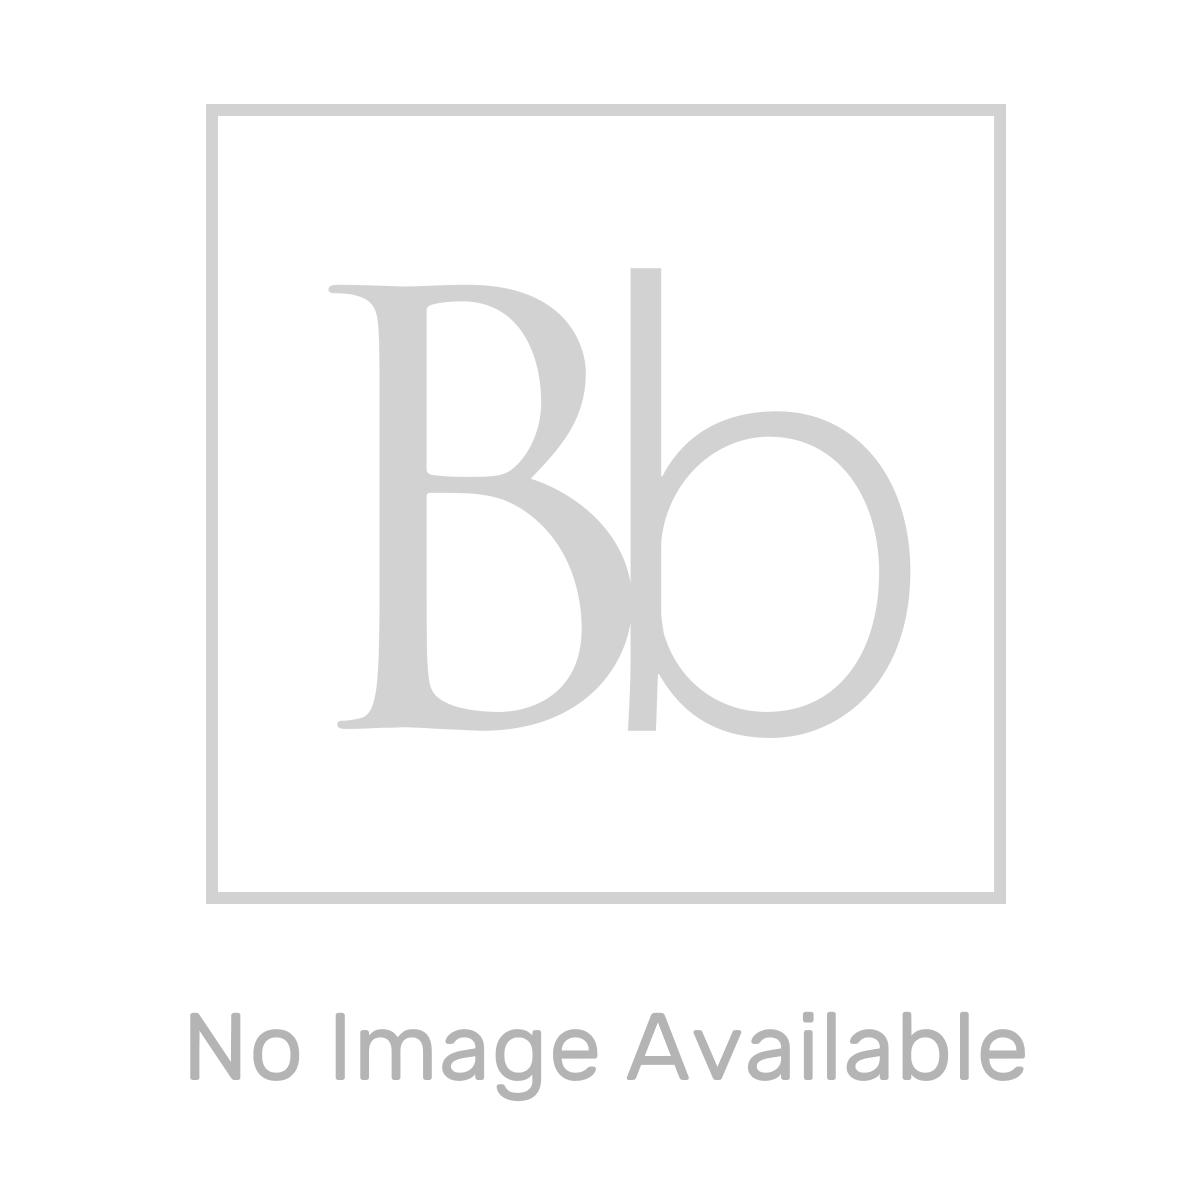 HiB Ambience 60 LED Steam Free Bathroom Mirror